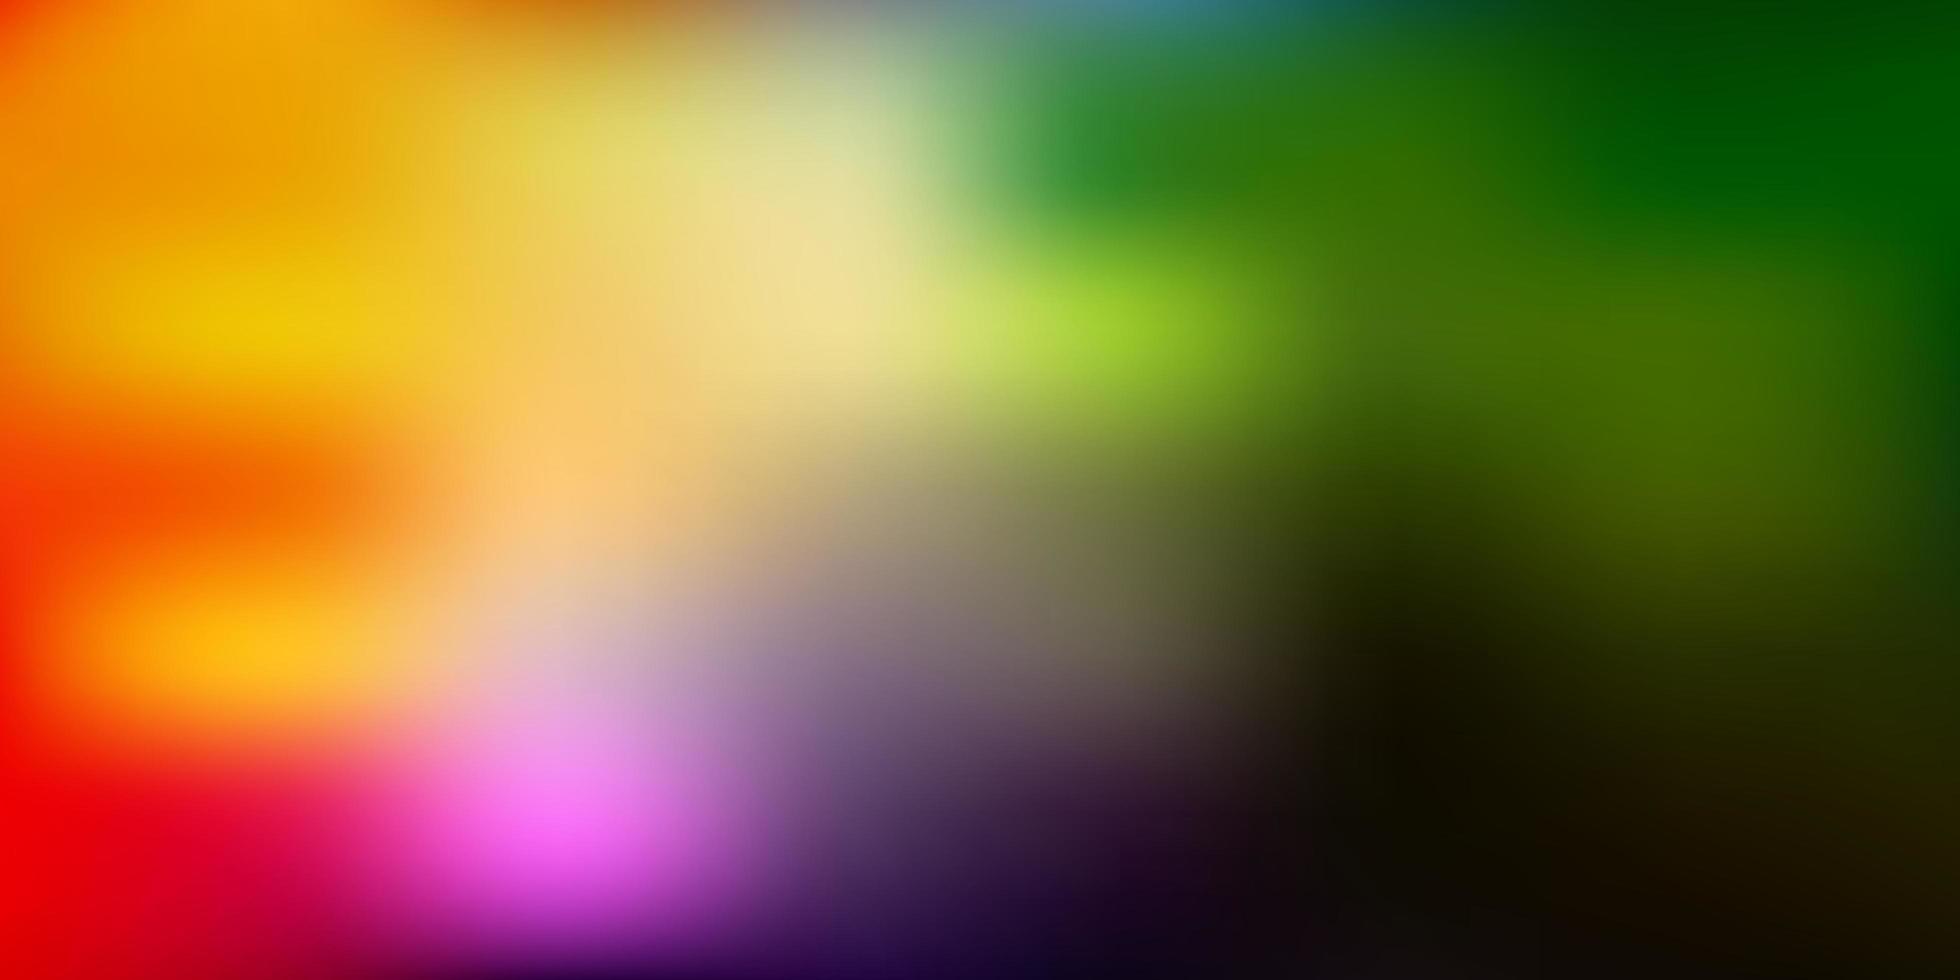 layout de borrão de luz multicolor vetor. vetor